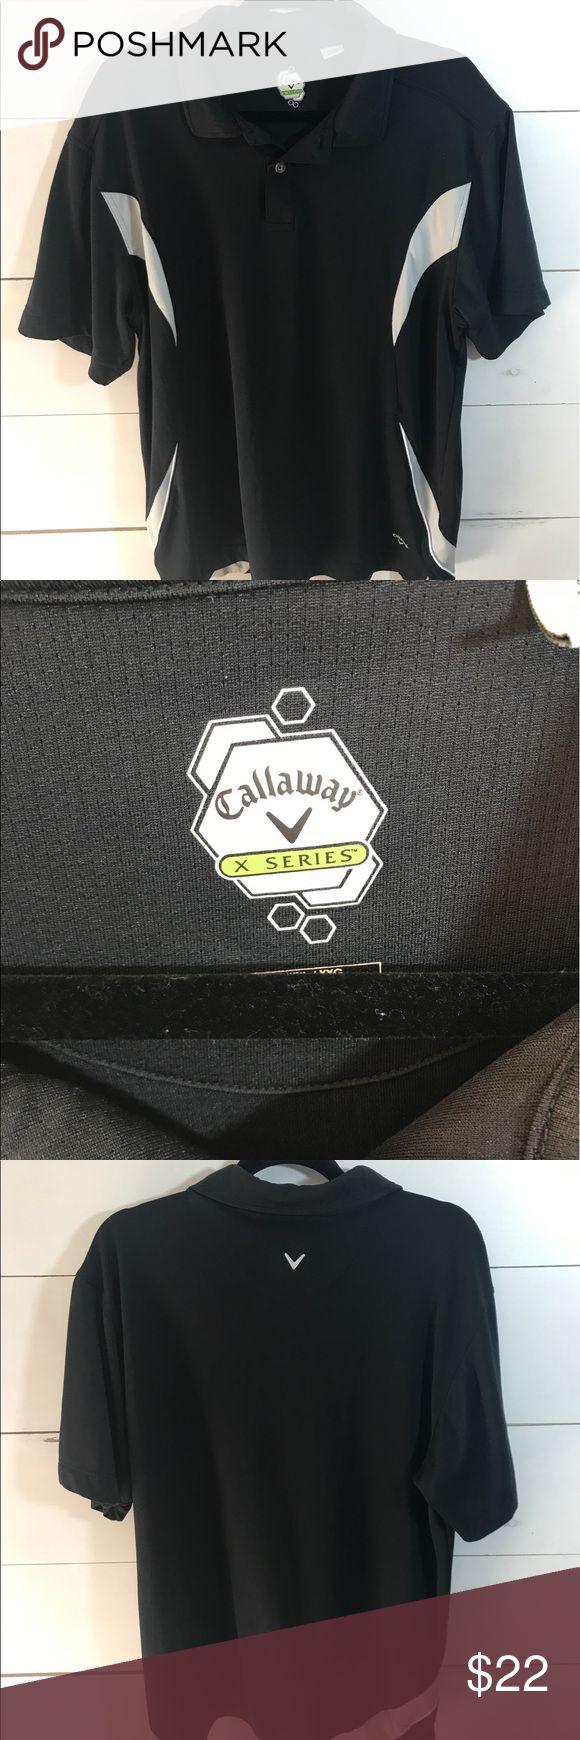 Callaway X Series Golf Polo Shirt Sz XXL Black Callaway X Series Golf Polo Shirt Sz XXL Black and gray good condition Callaway Shirts Polos